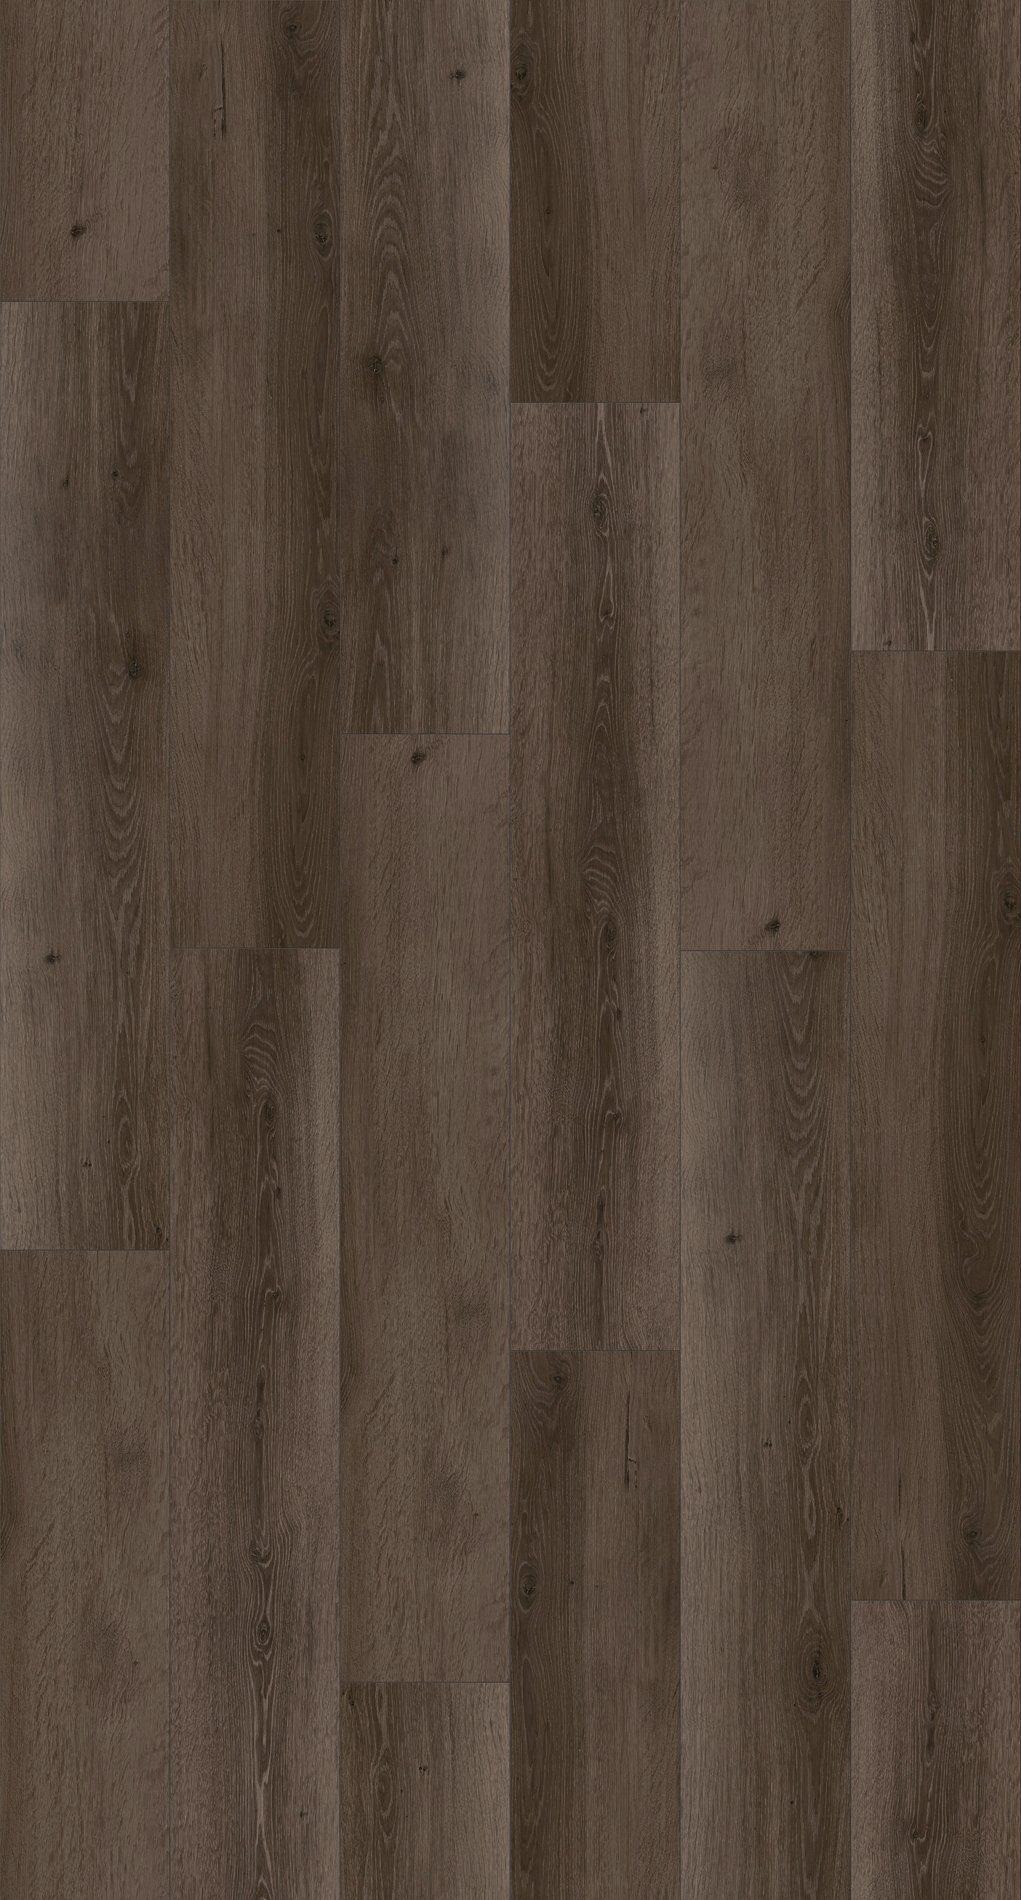 PARADOR Packung: Vinylboden »Classic 2050 - Eiche Skyline Grau«, 1215 x 219 x 5 mm, 2,1 m²